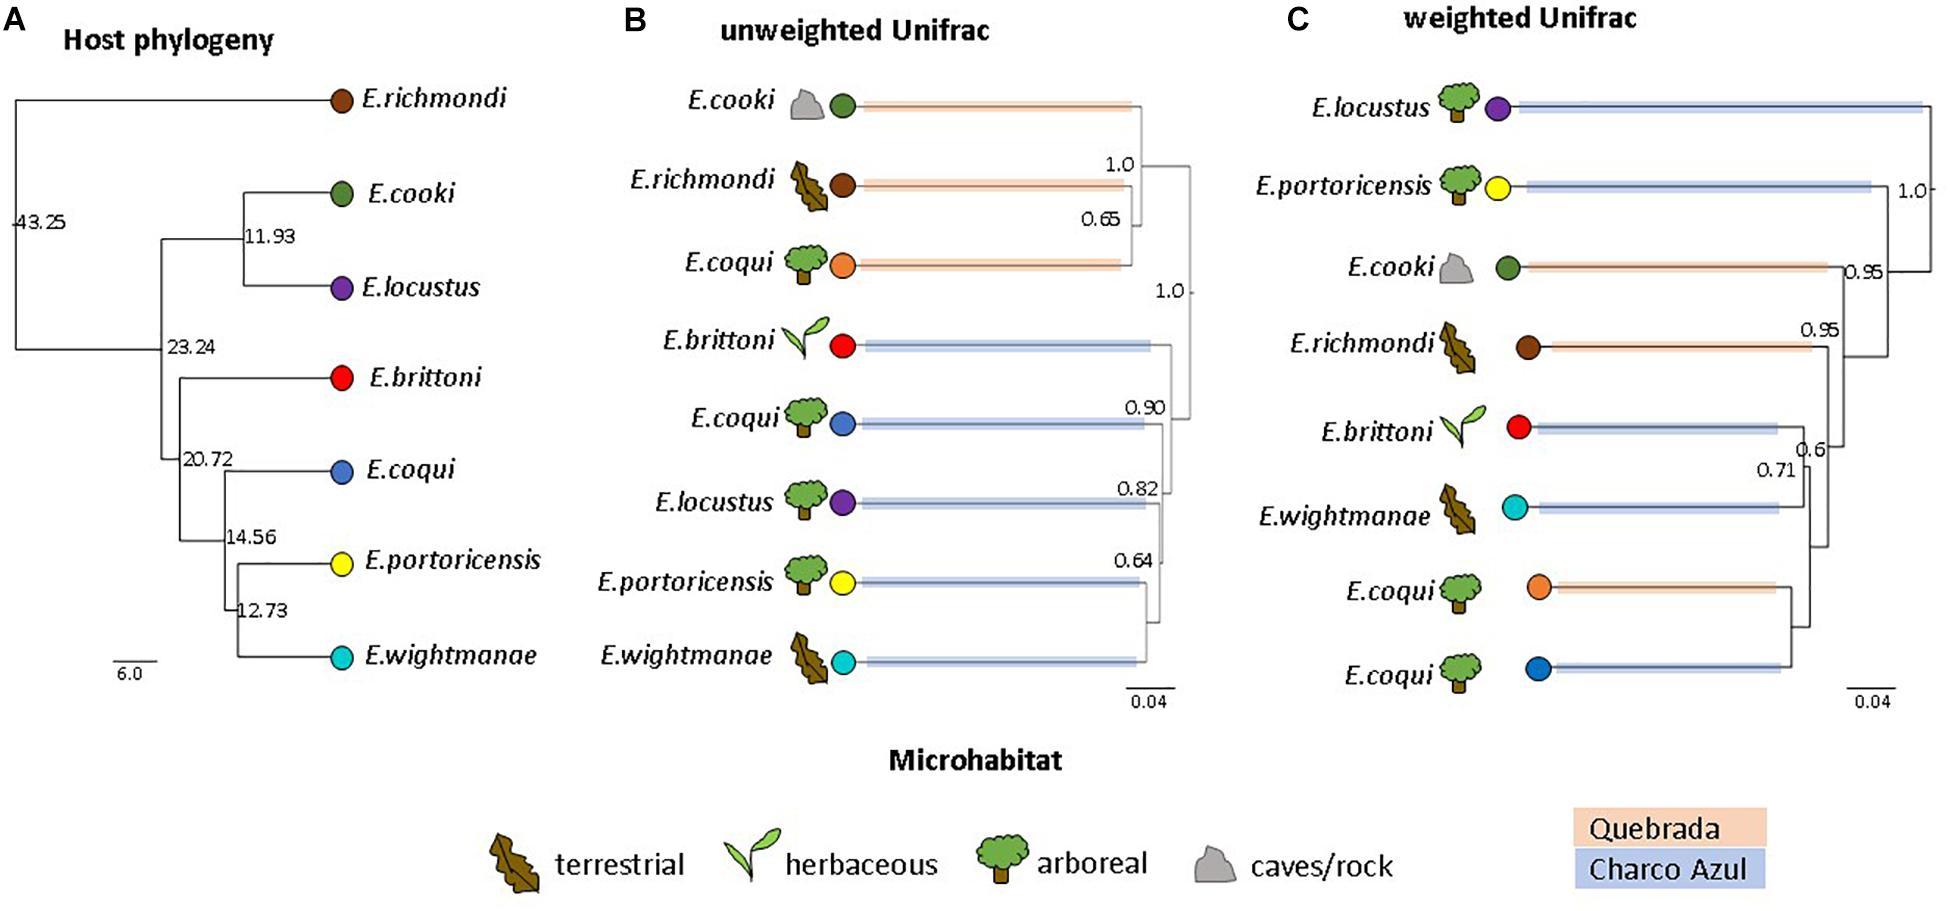 Frontiers | The Skin Microbiota of Eleutherodactylus Frogs